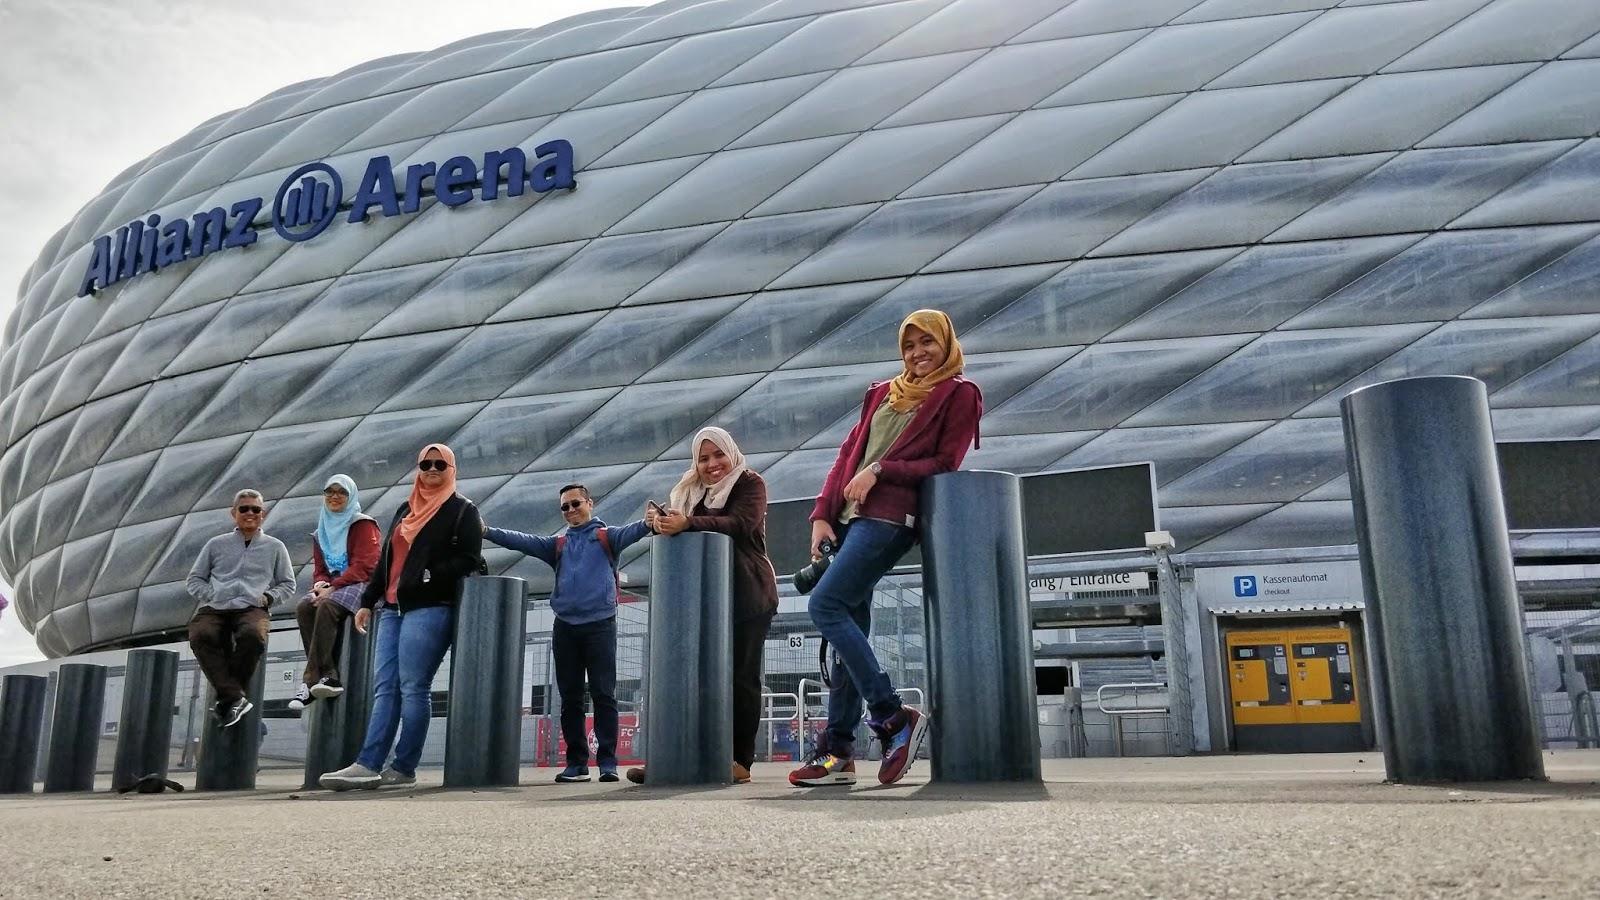 Allianz Arena at Munich, Germany